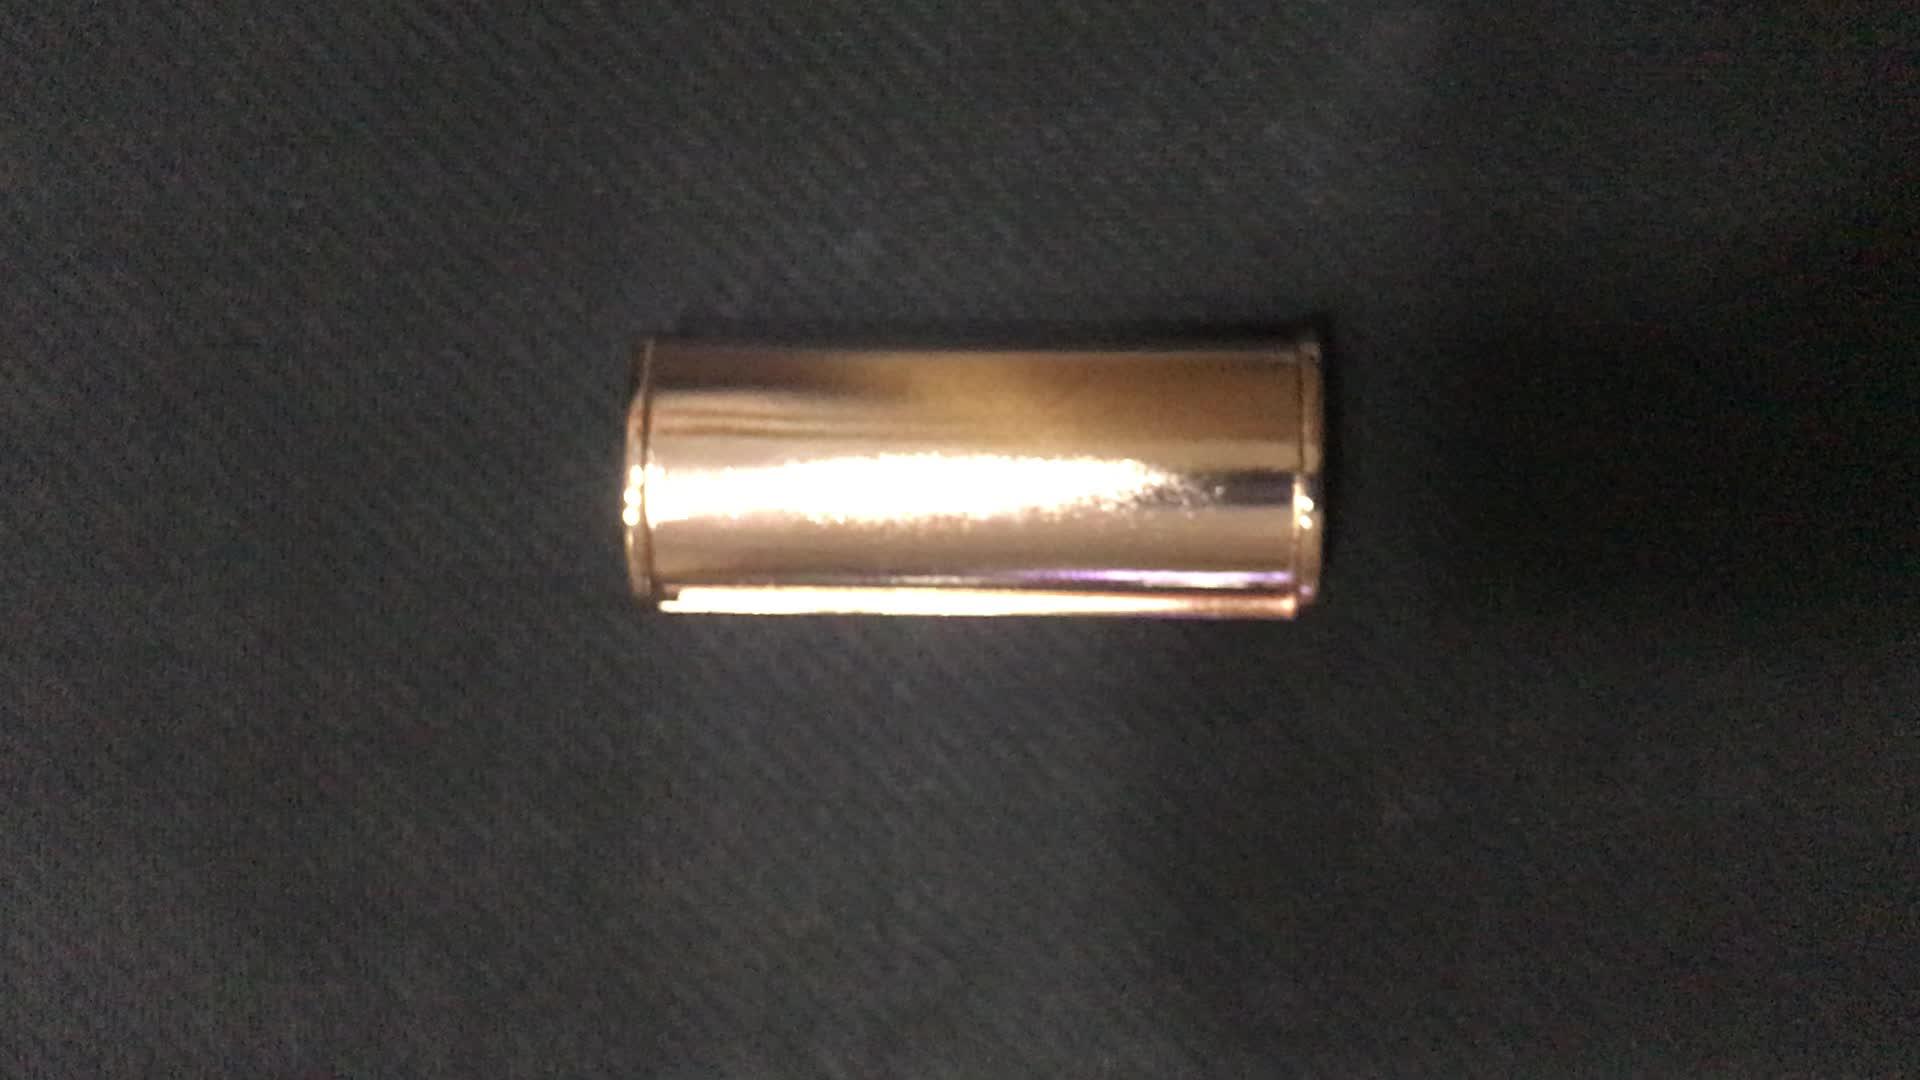 US Hot Selling popular zinc alloy metal cover case lighter sleeve